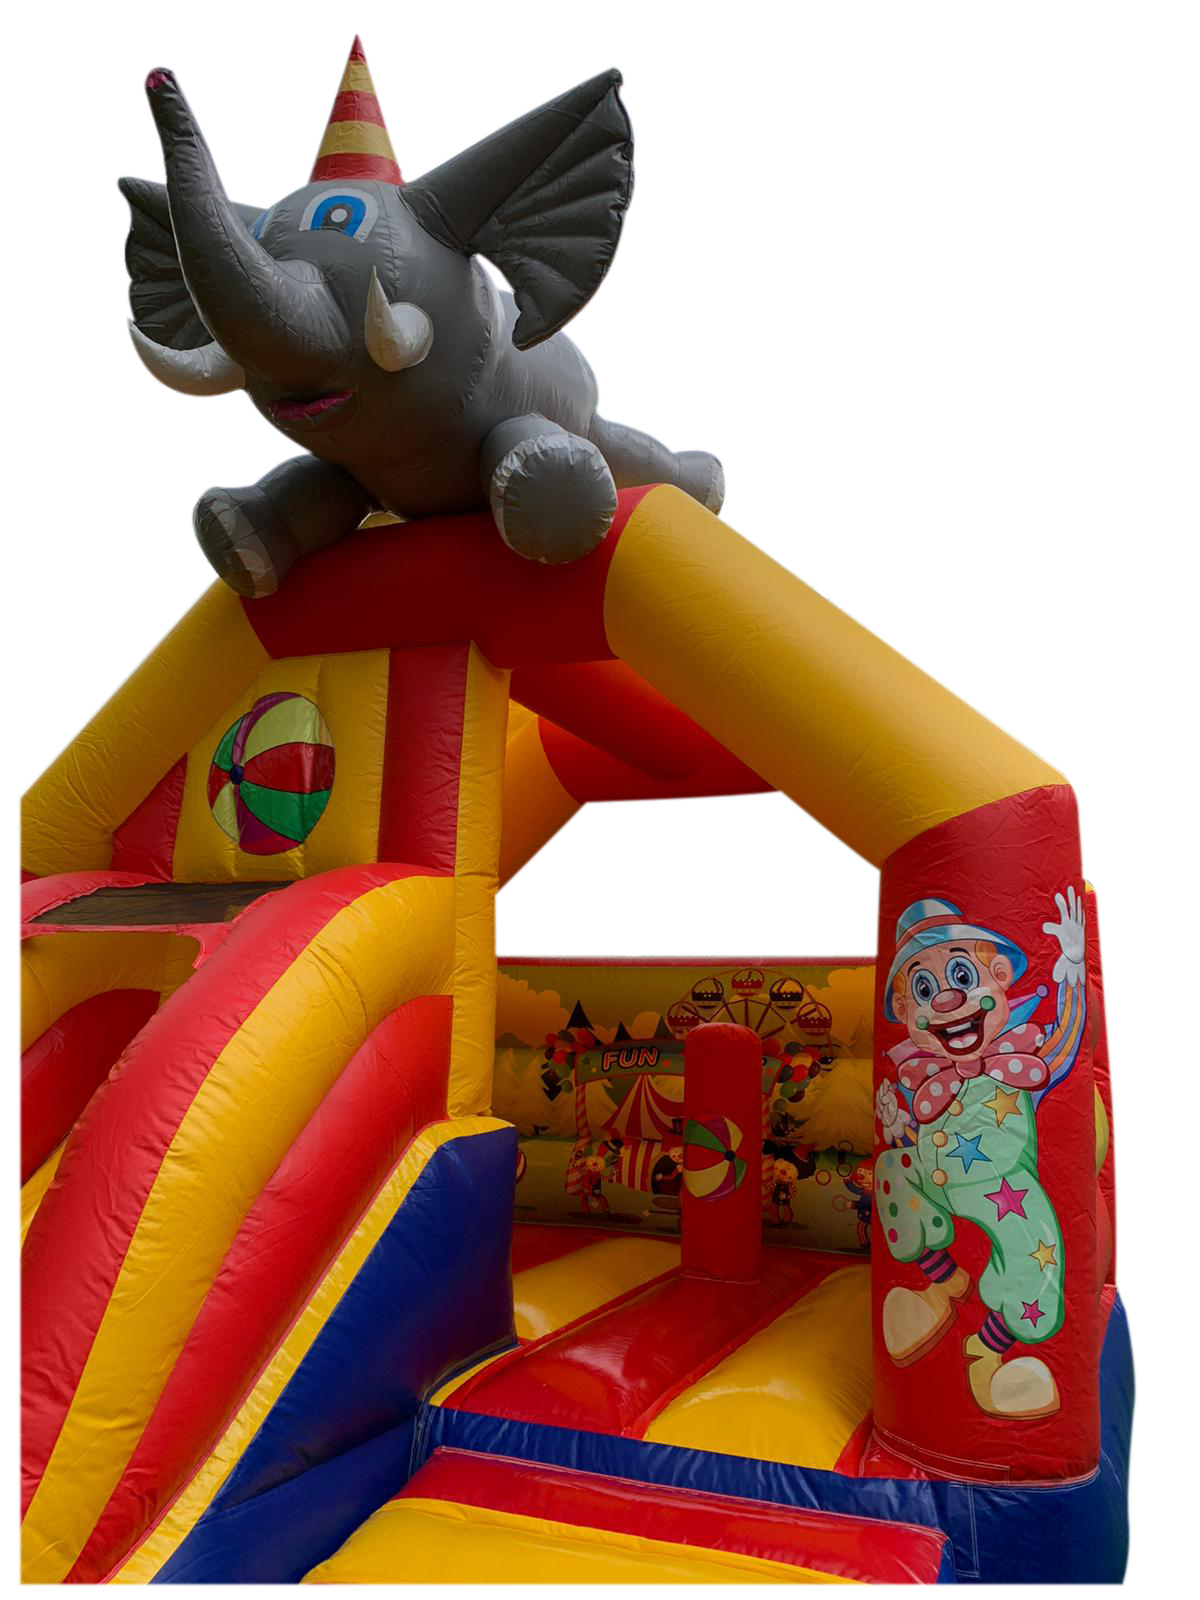 Hüpfburg kleiner Elefant